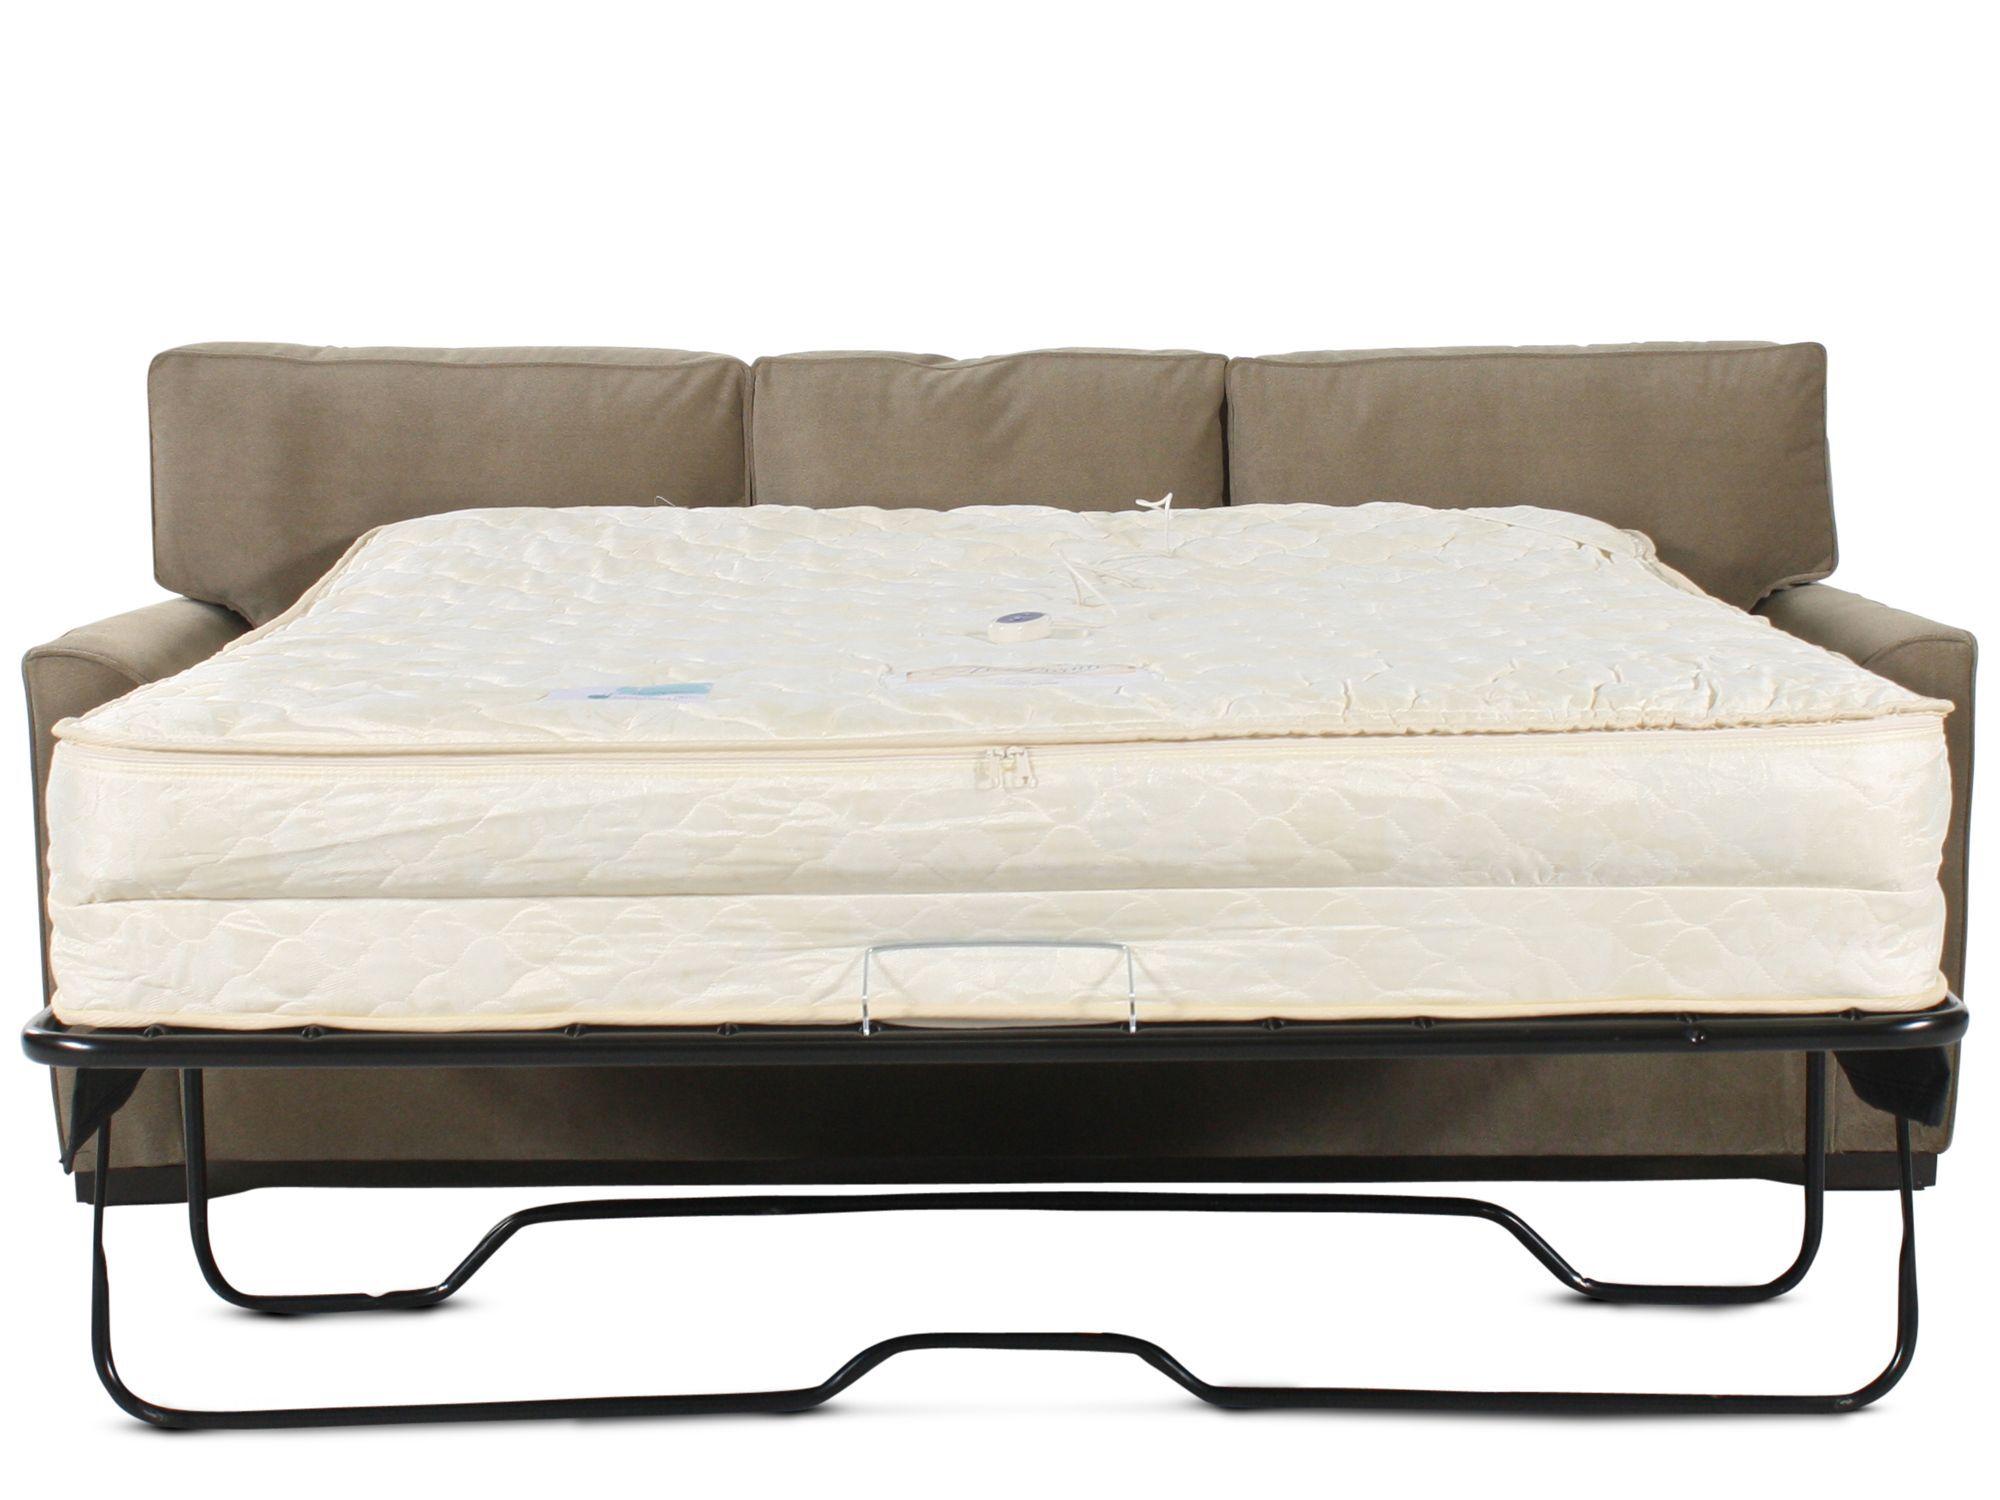 jonathan louis sofa bed throw pillows queen sleeper with air mattress